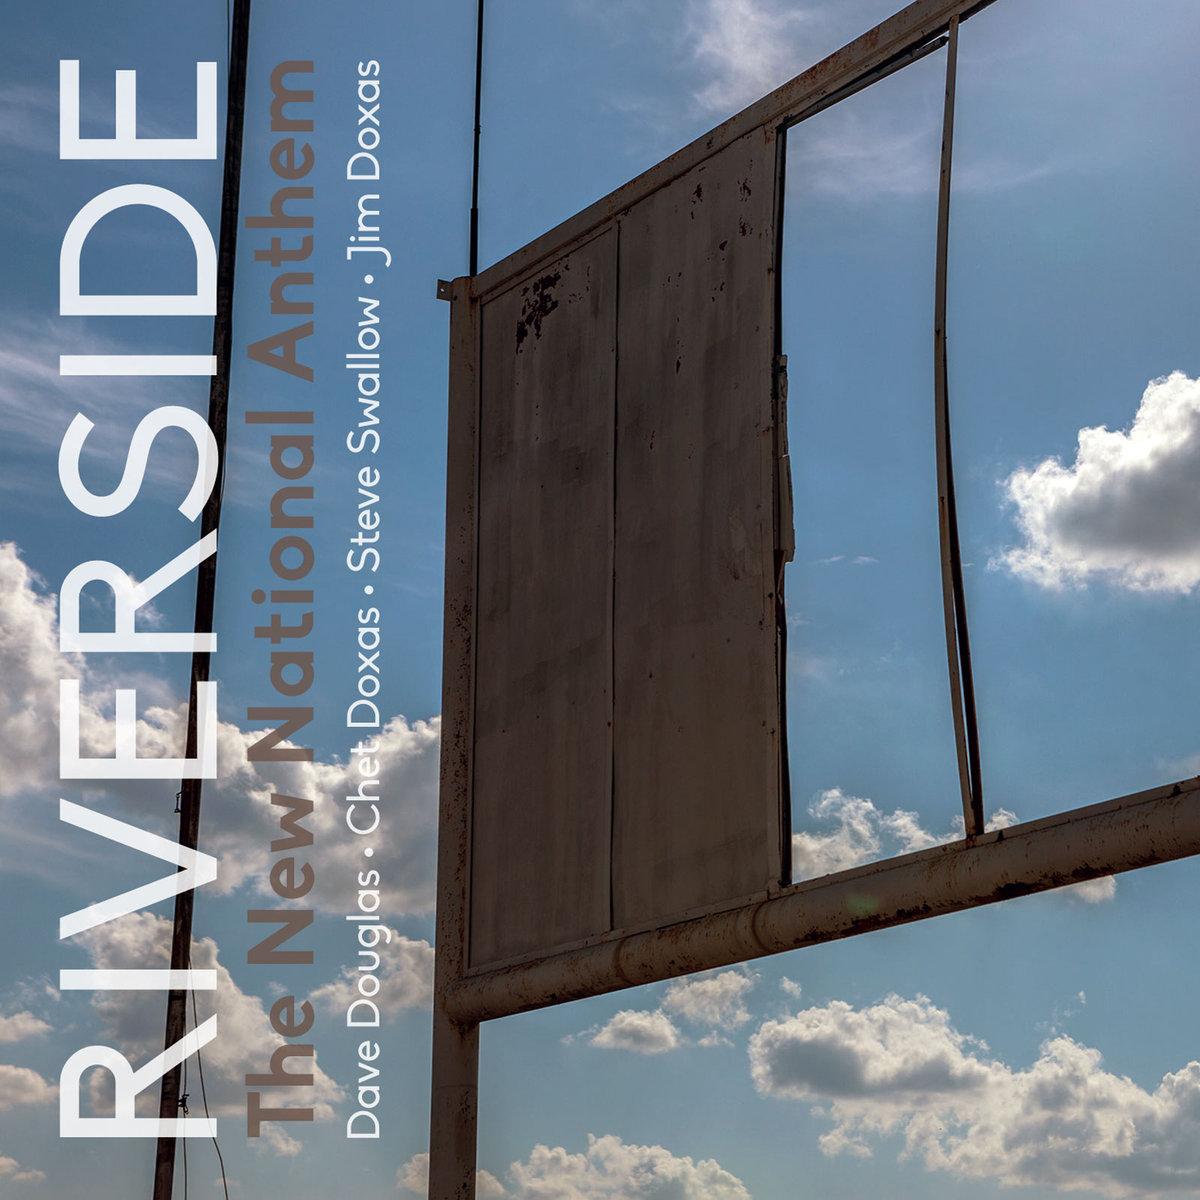 http://downbeat.com/images/reviews/riverside_the_new_national_anthem.jpg